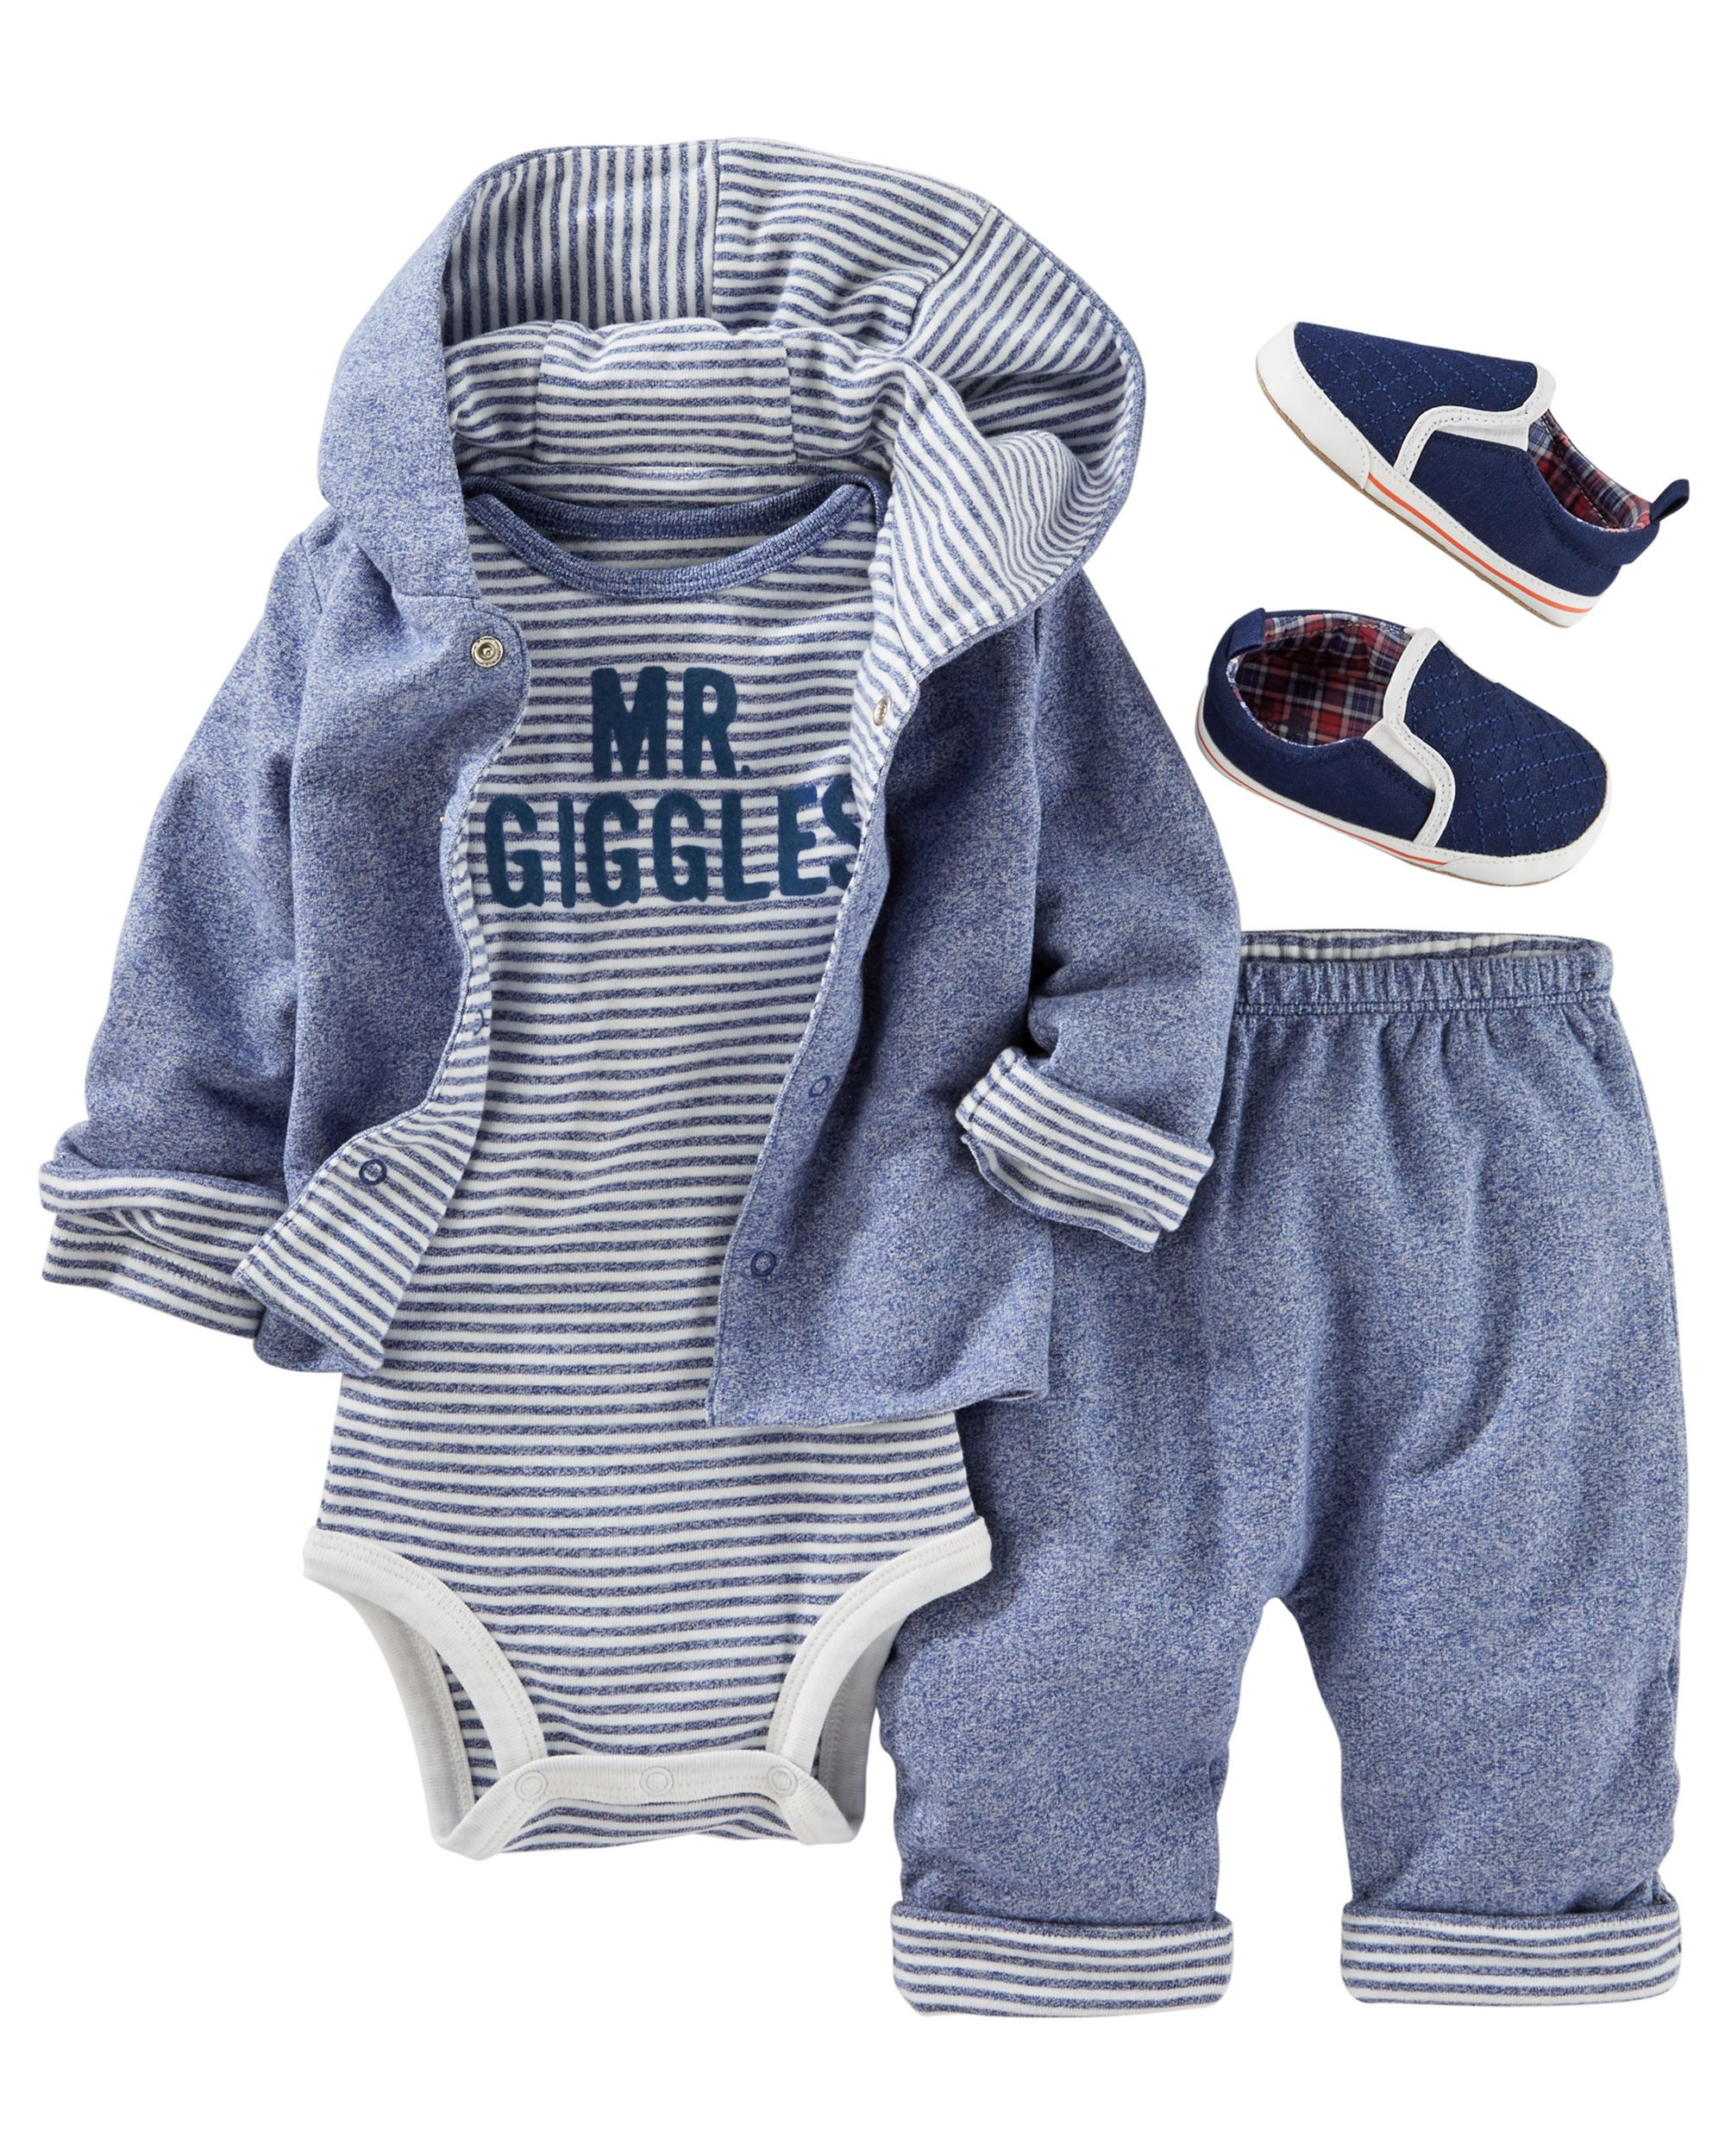 ffbdb3064 Baby Boy OKS17DECBABY37 | OshKosh.com Roupas De Bebe Masculino, Roupa De  Bebe Menina